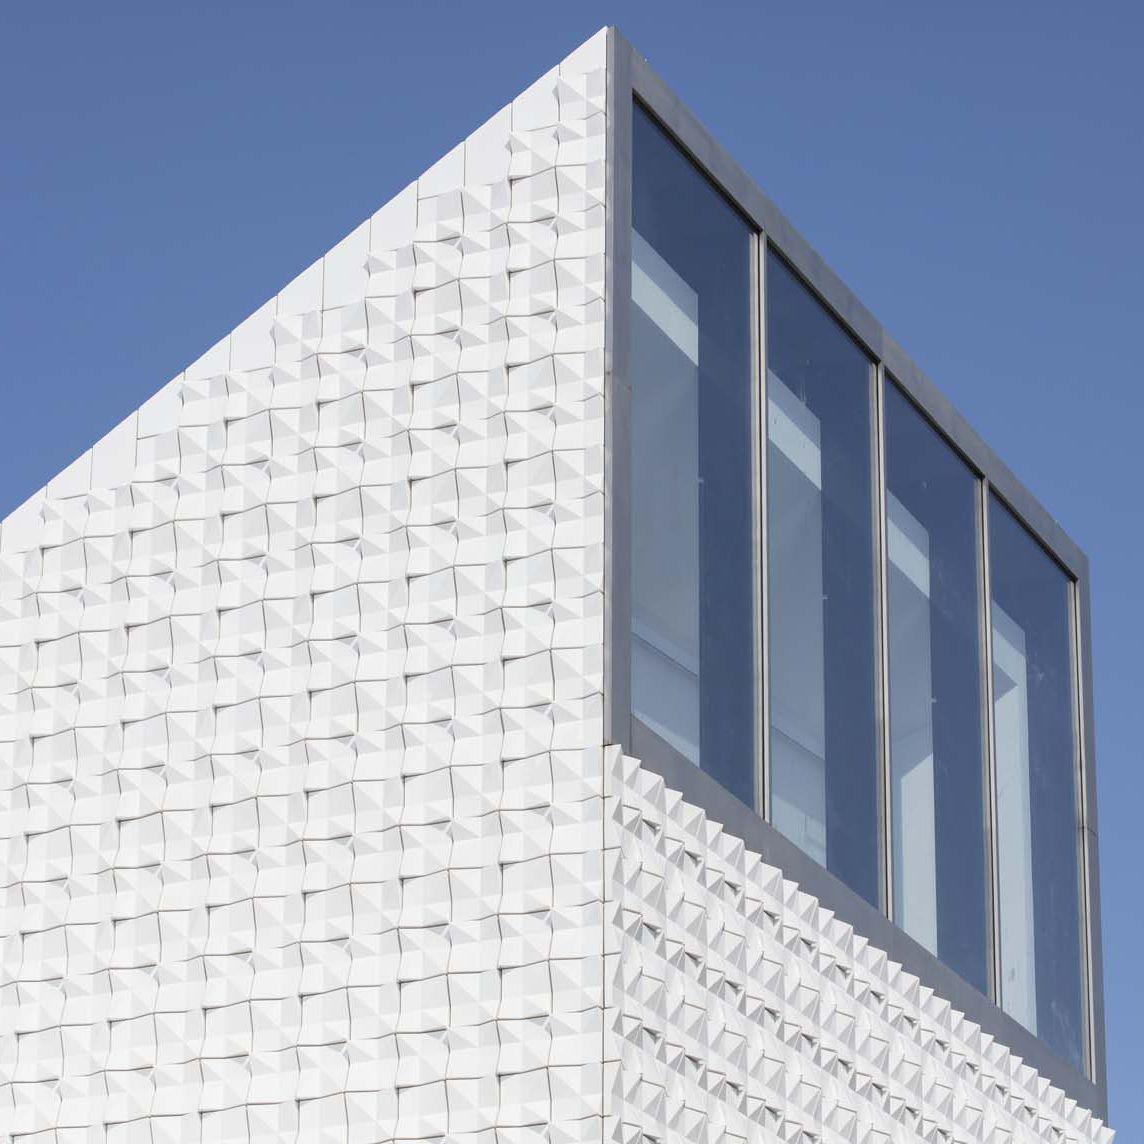 Design Cladding Ceramic 3d Tile Look St Michael Poing